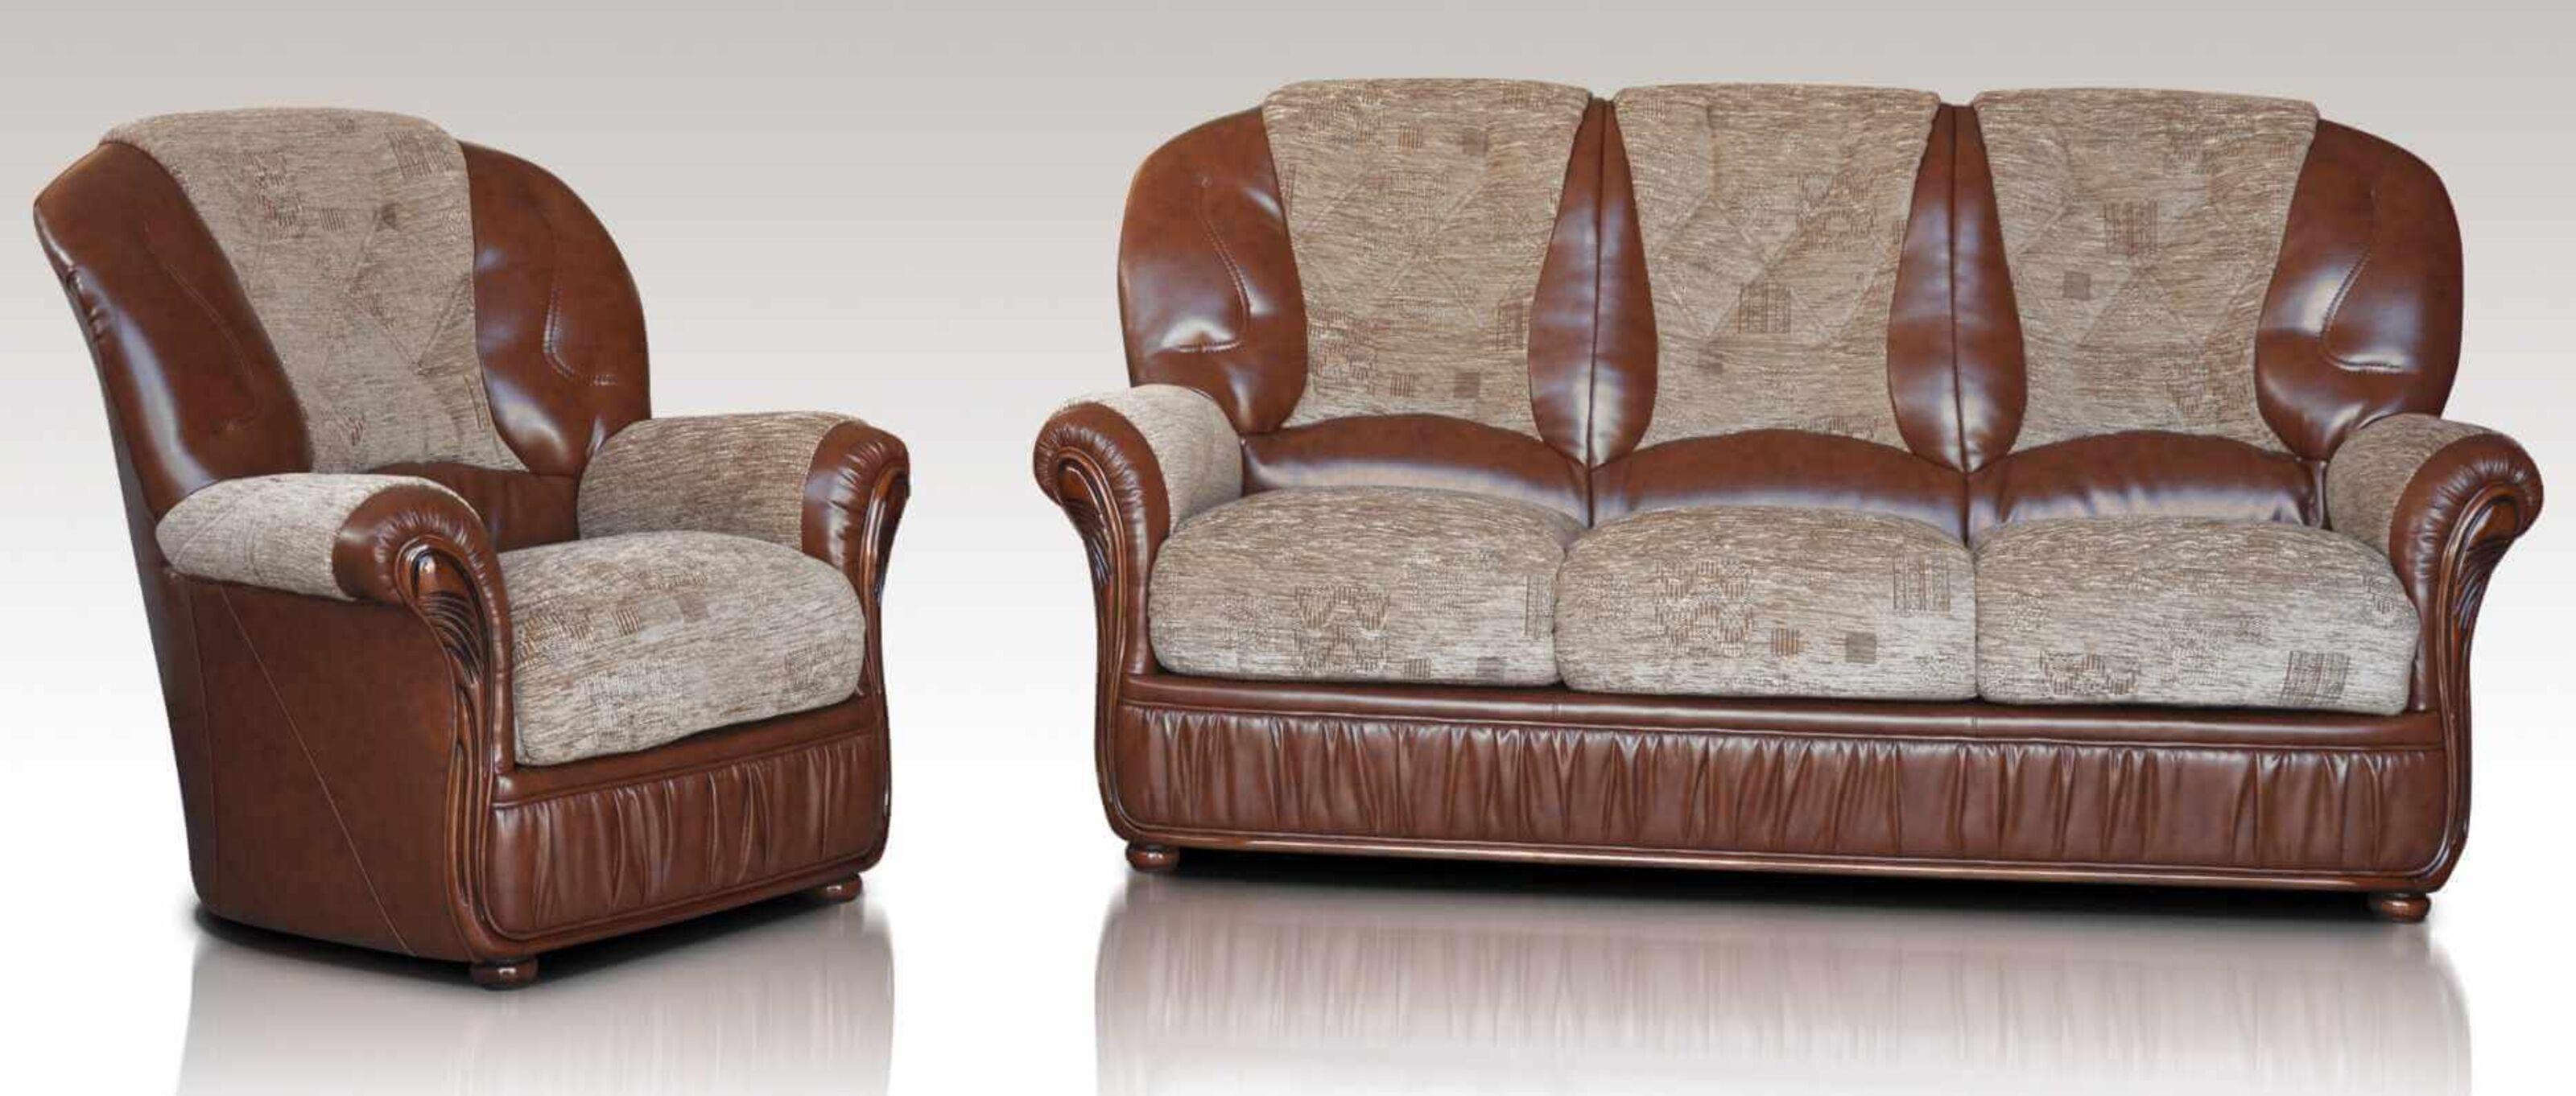 Astonishing Emma 3 1 Genuine Italian Brown Leather Fabric Sofa Suite Offer Interior Design Ideas Gentotthenellocom